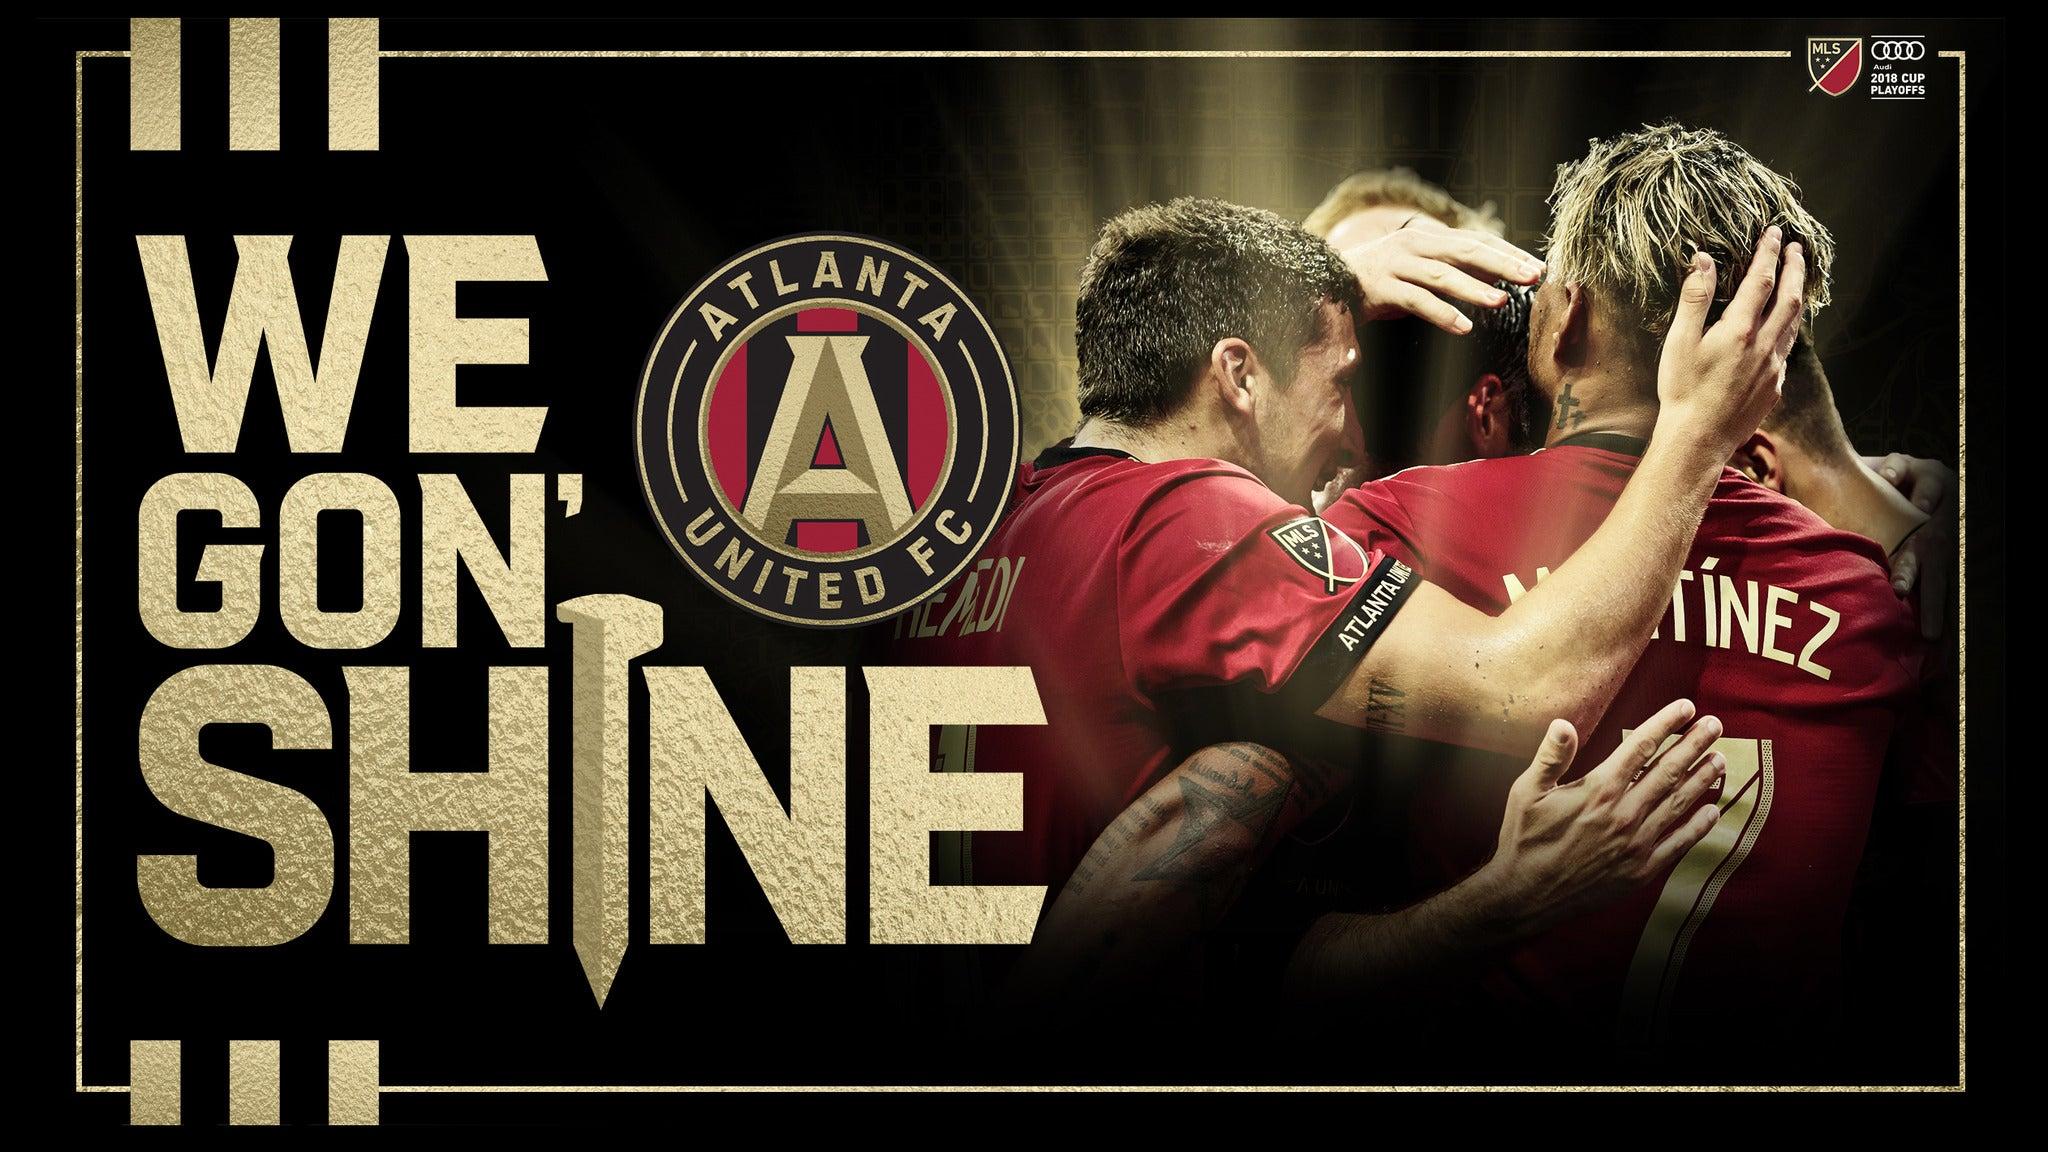 SORRY, THIS EVENT IS NO LONGER ACTIVE<br>Eastern Conference Semi-Final: Atlanta United vs. NYCFC - Atlanta, GA 30313